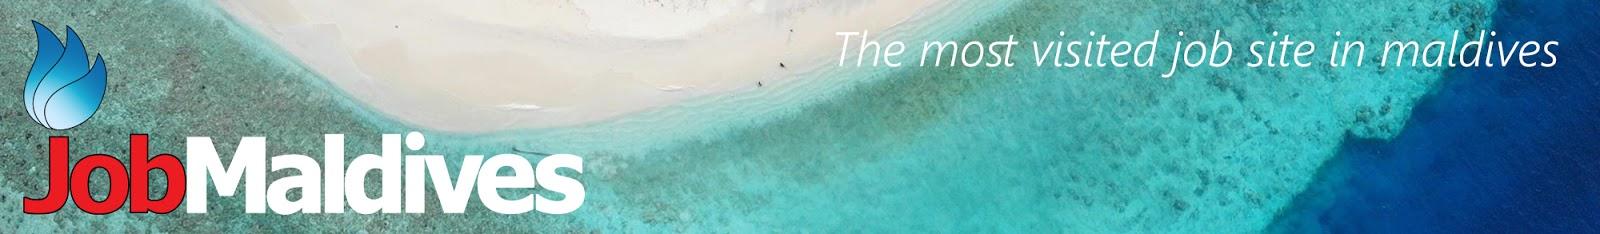 Job Maldives: Carpenter Job Vacancy at Hurawalhi Island Resort